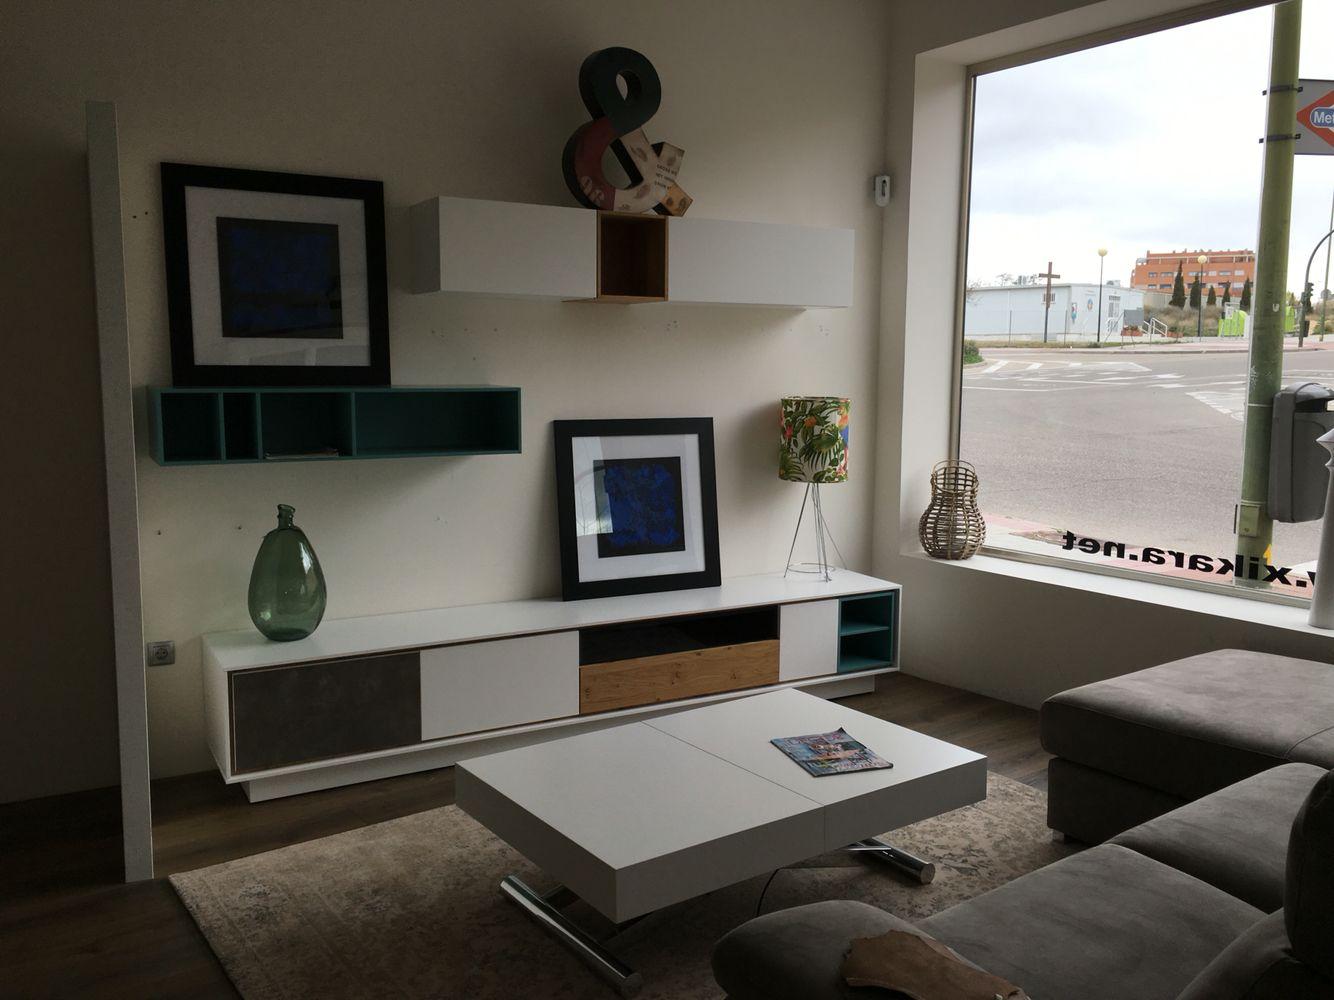 Mueble de sal n de dise o xikara design pinterest for Muebles imitacion diseno